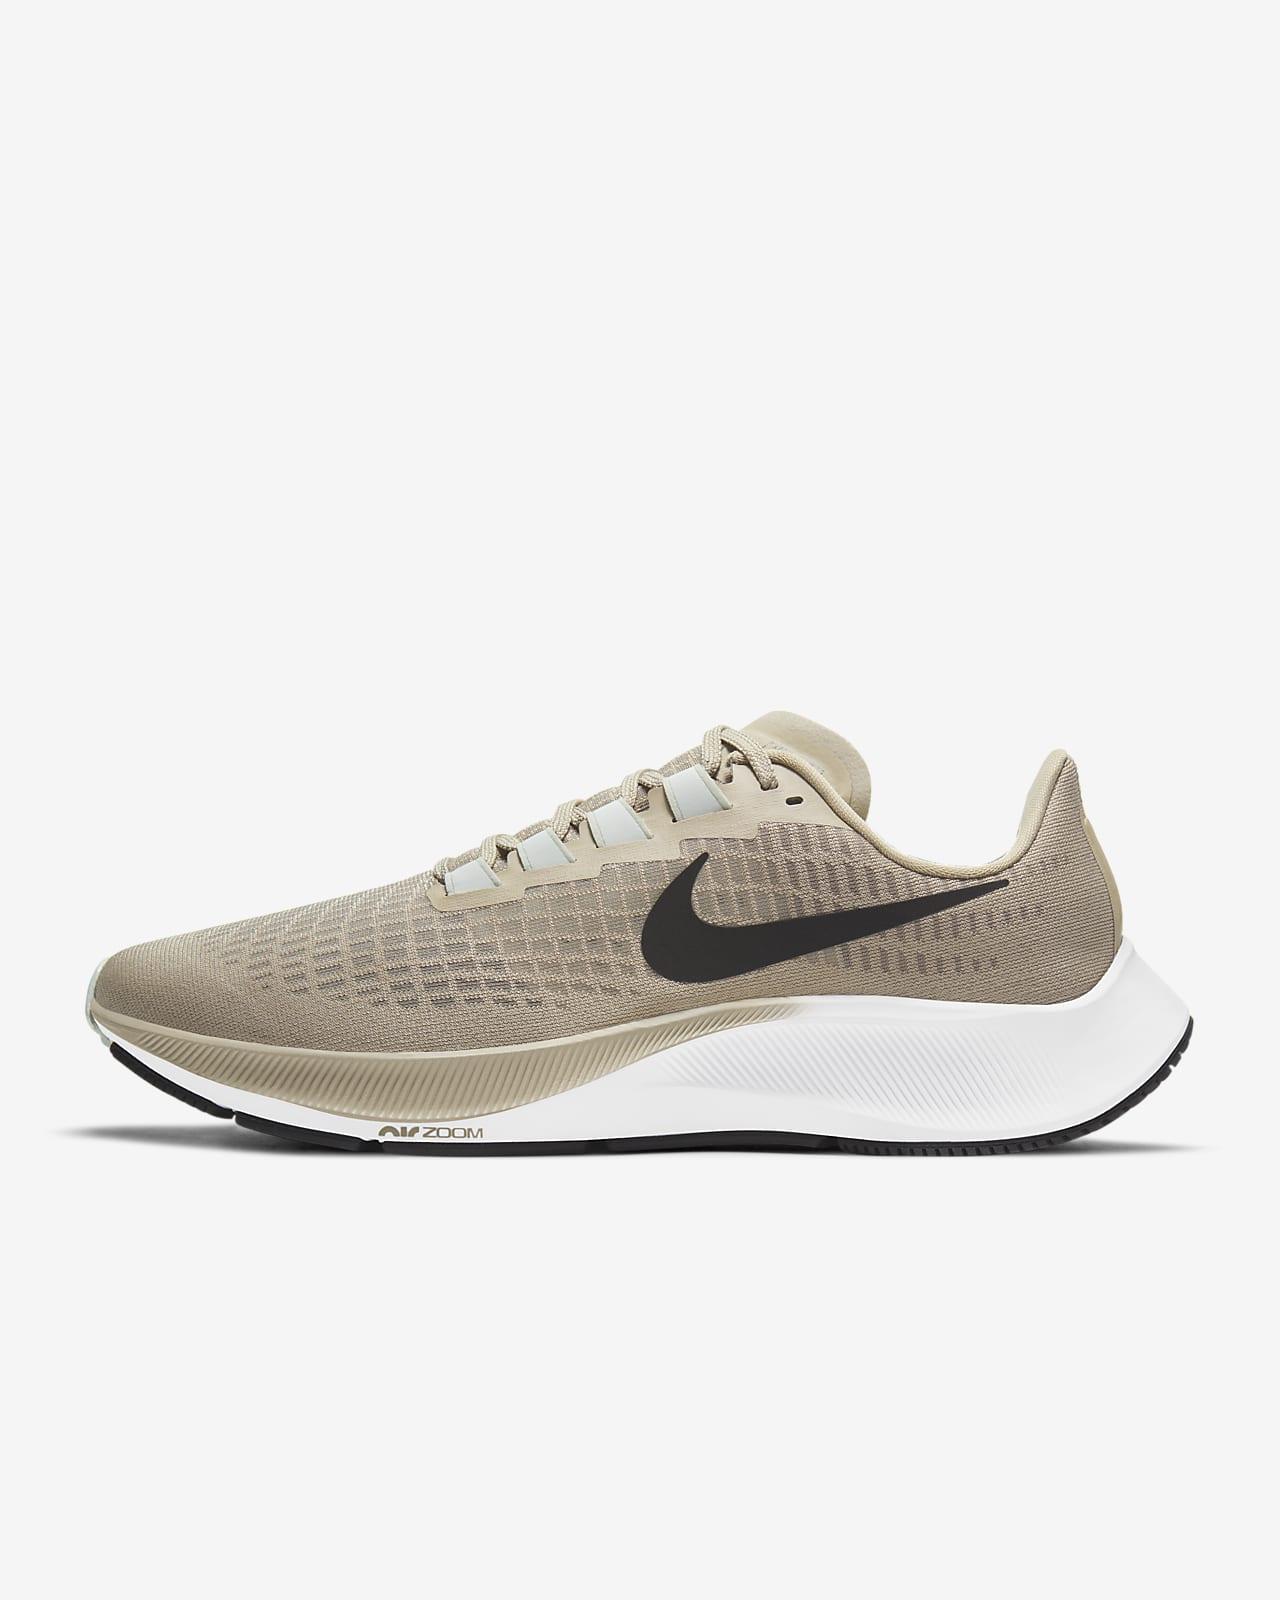 Chaussure de running Nike Air Zoom Pegasus 37 pour Homme